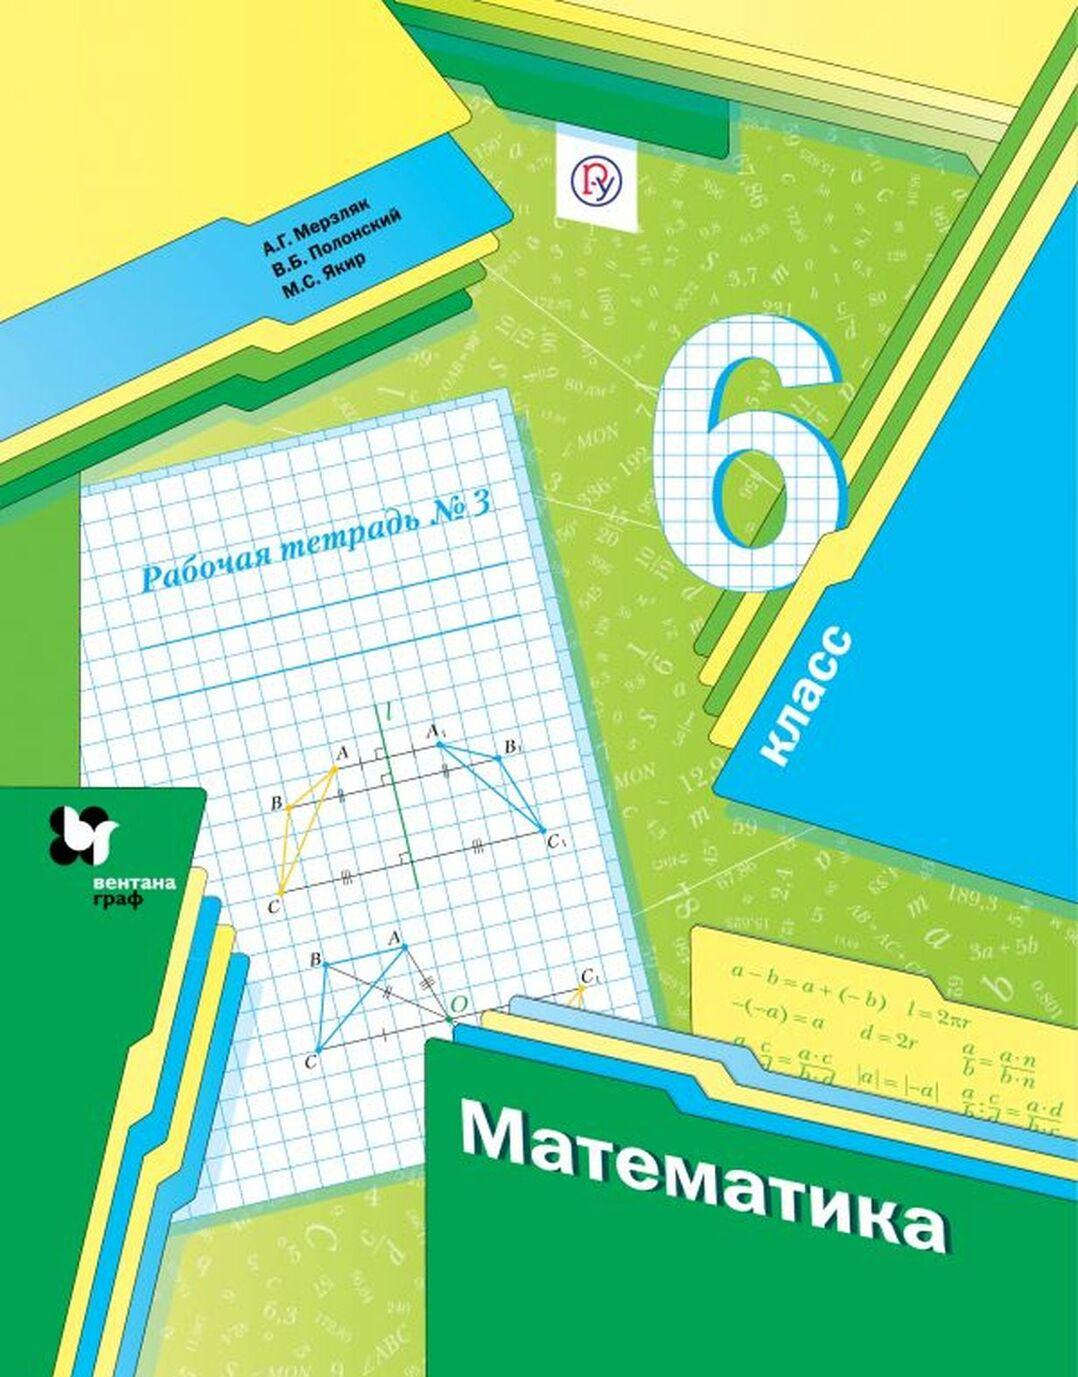 Matematika. 6klass. Rabochaja tetrad. V 3-kh chastjakh. Chast 3 | Merzljak Arkadij Grigorevich, Jakir Mikhail Semenovich